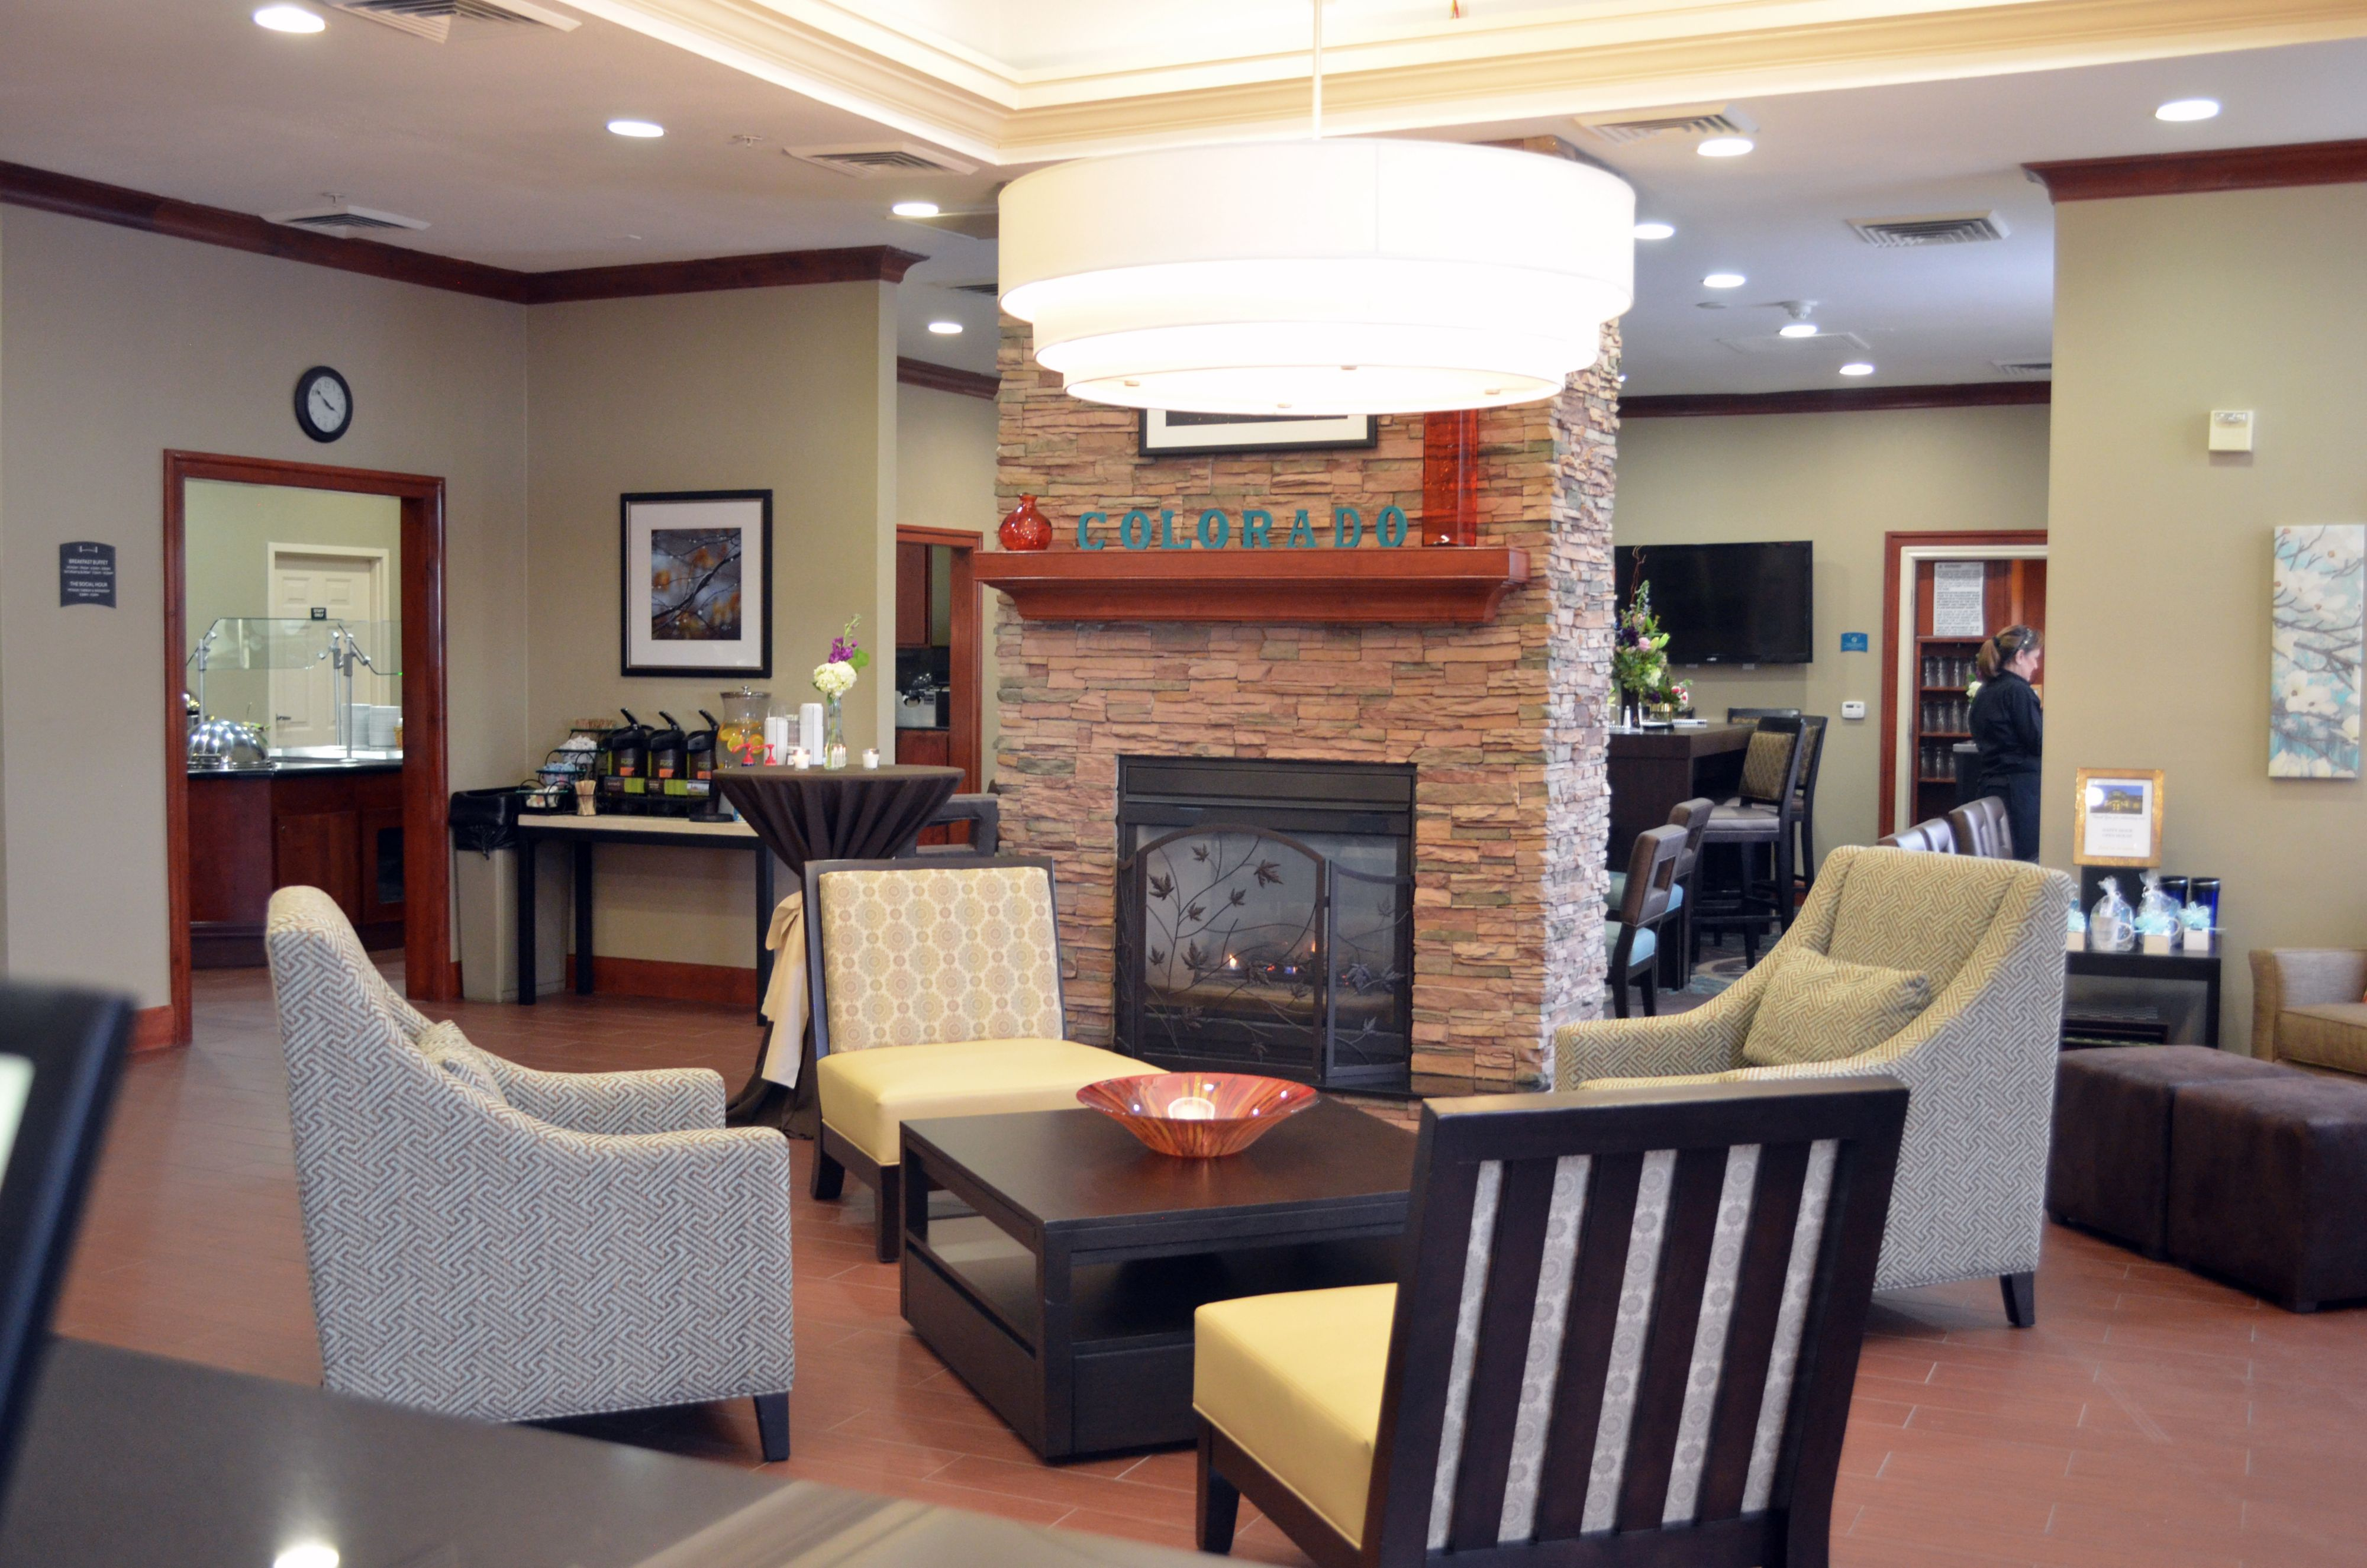 Staybridge Suites Denver Tech Center image 2